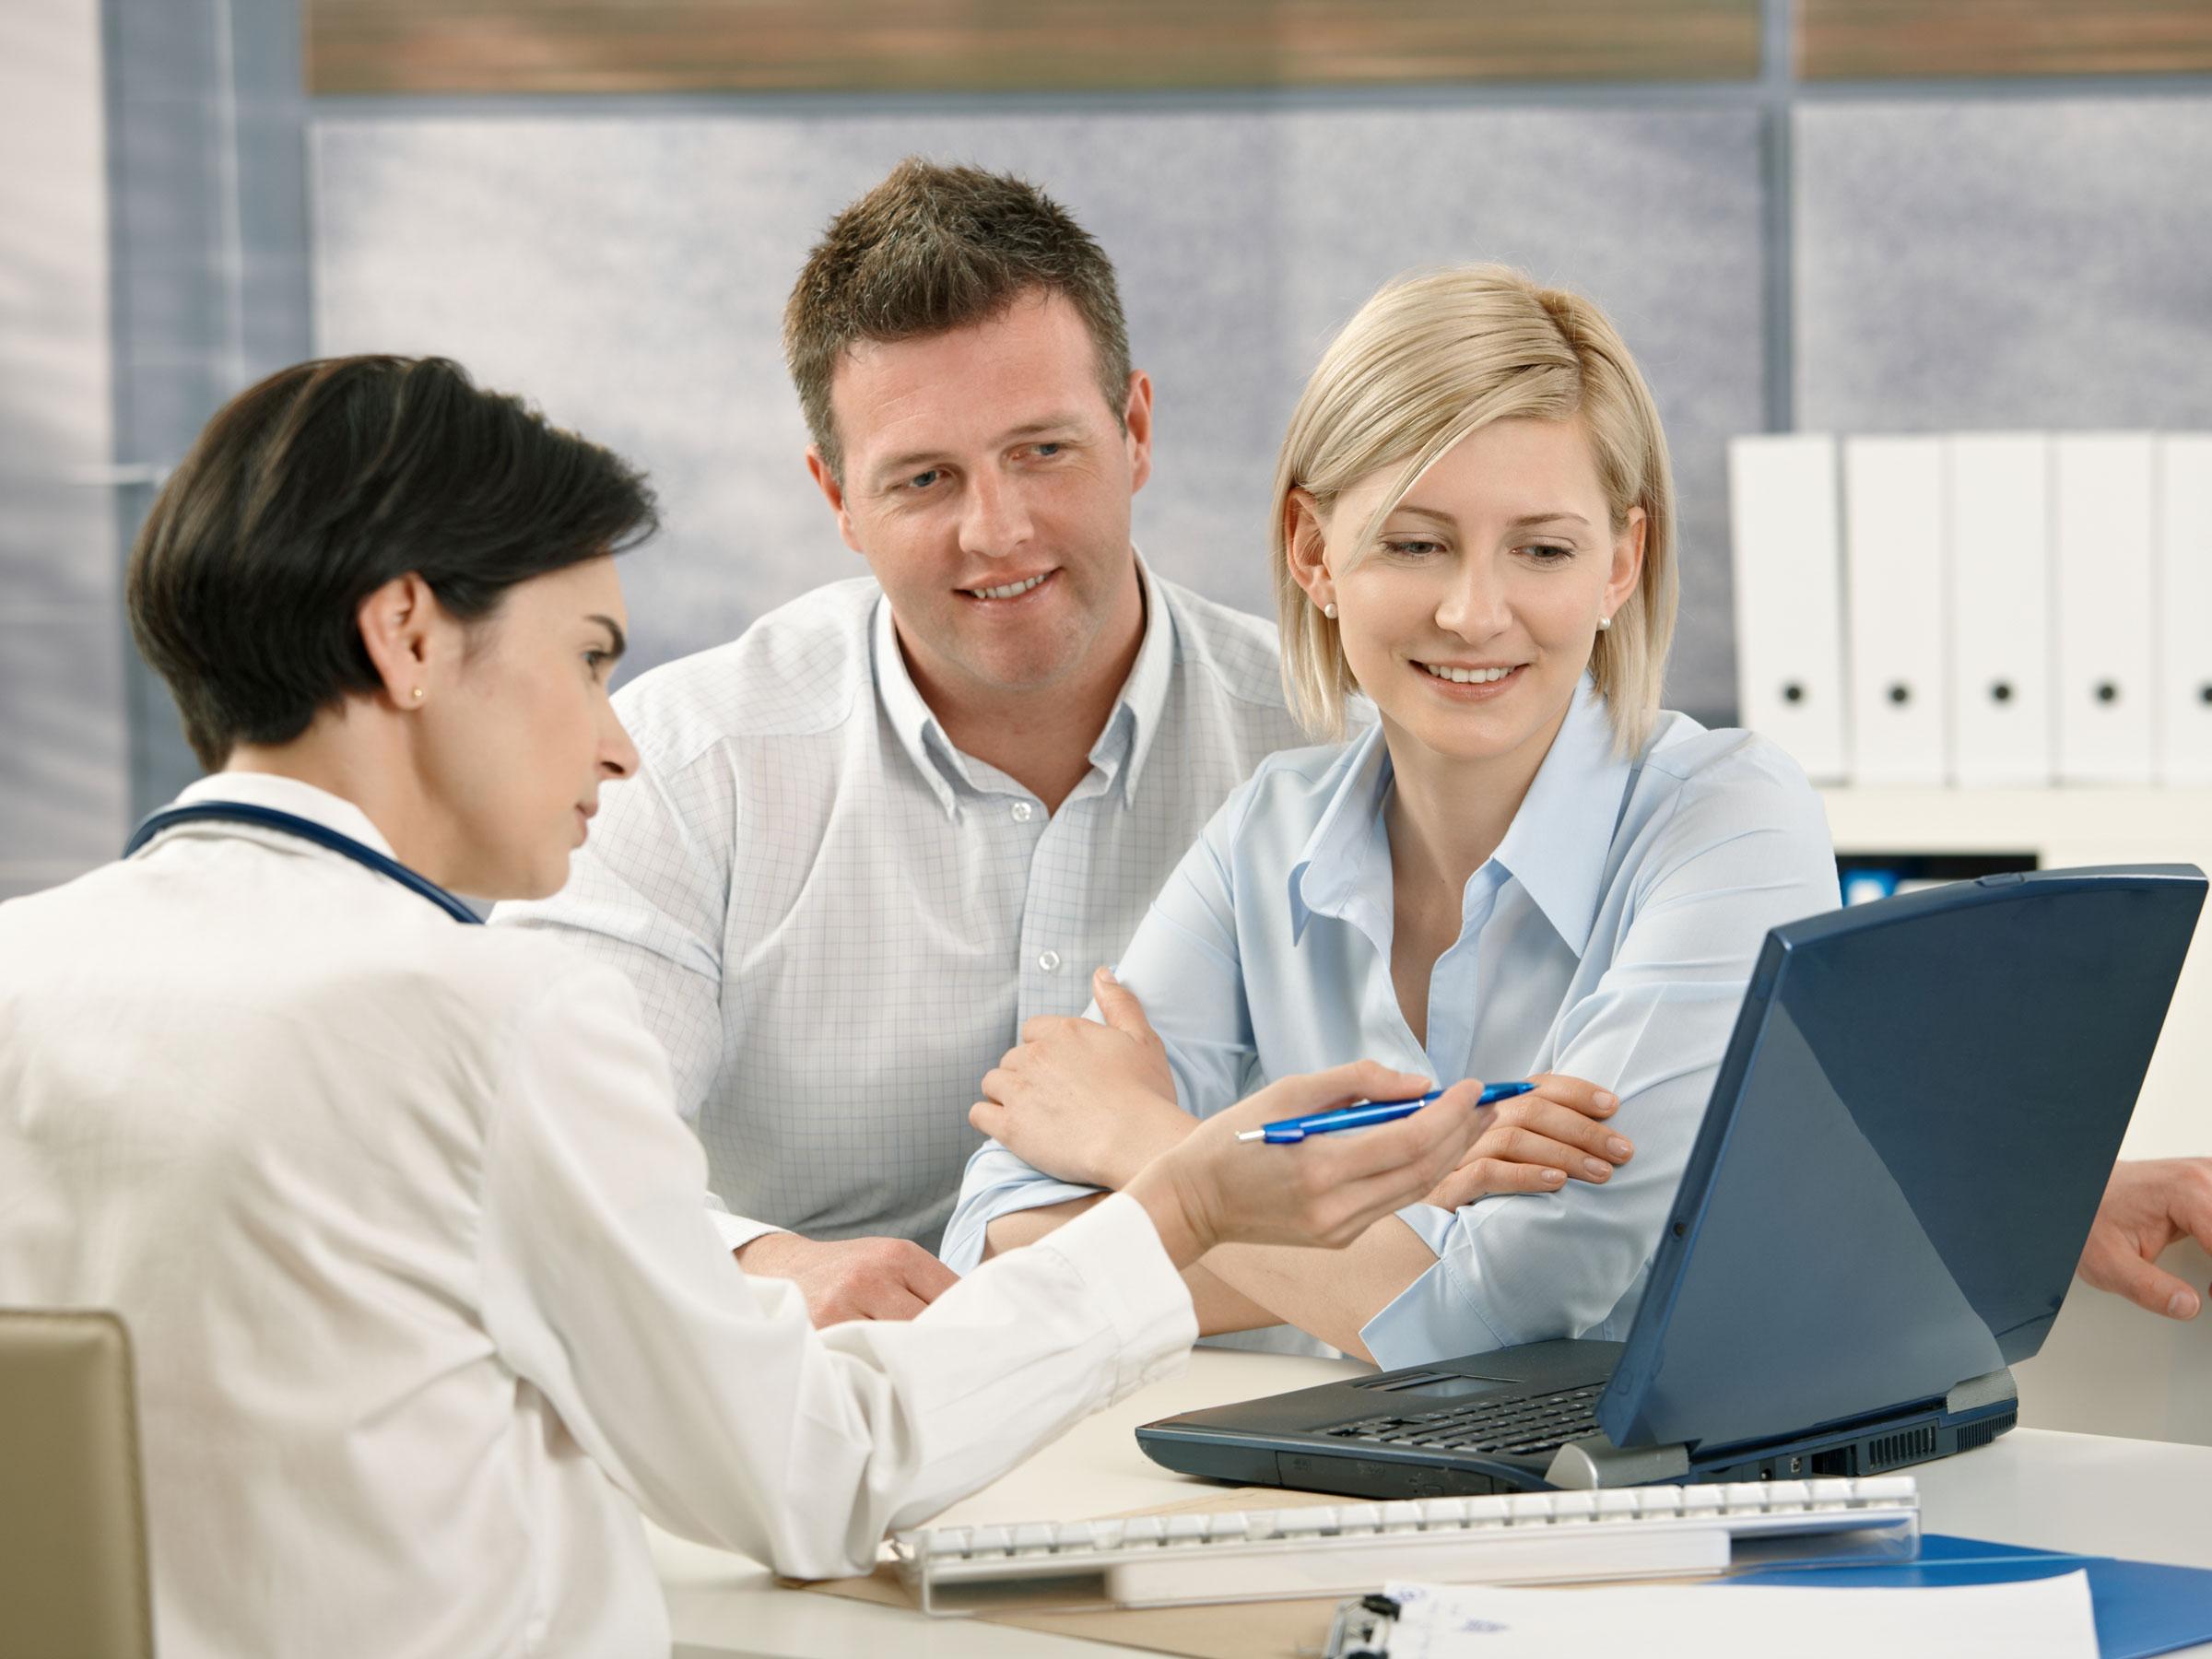 doc-with-patients-laptop-.jpg